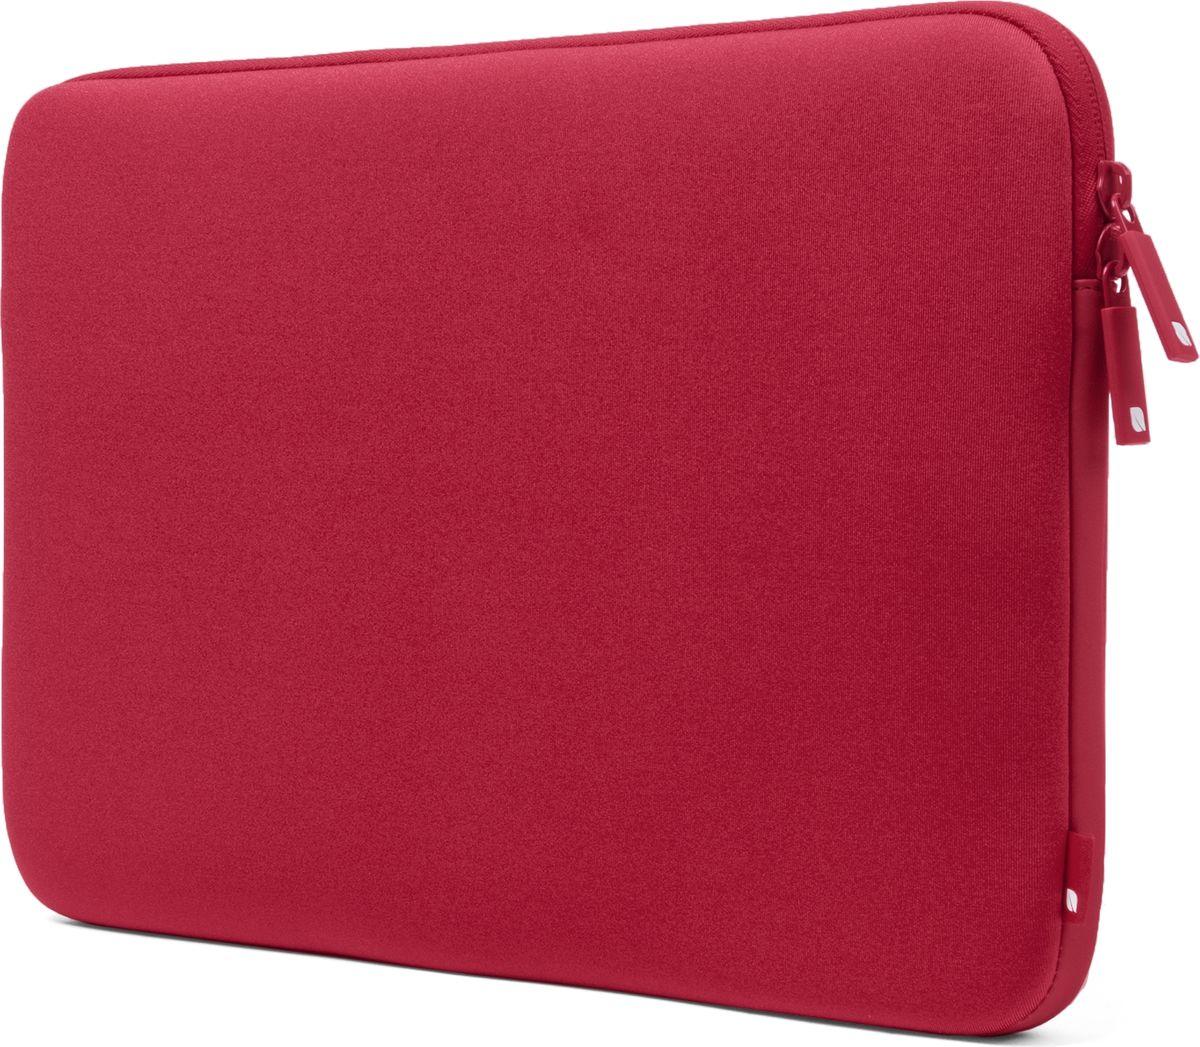 "Incase Neoprene Classic Sleeve чехол для Apple MacBook Pro 15"", Racing Red"